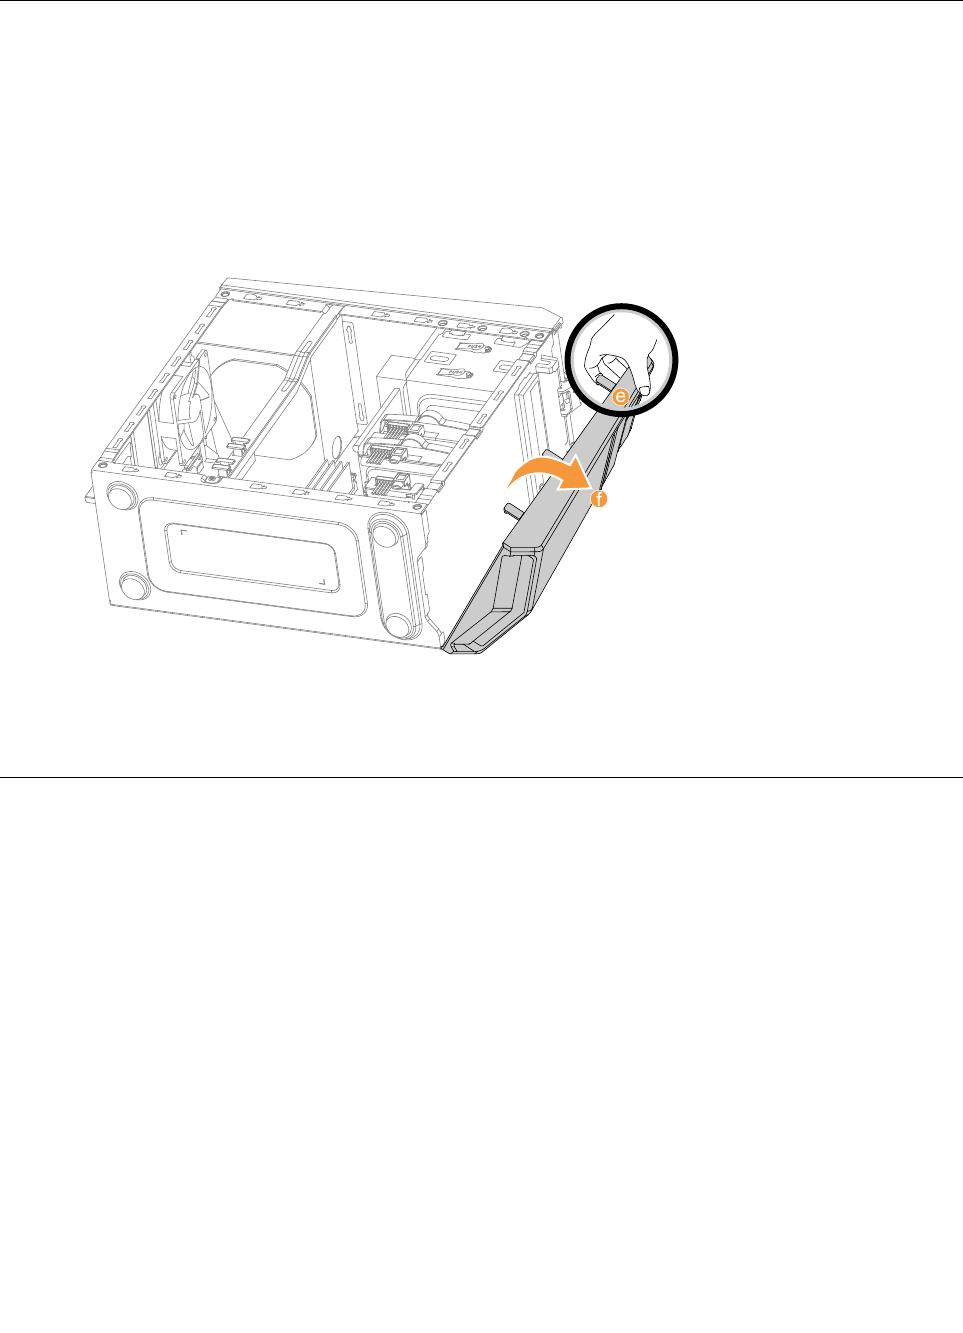 Lenovo Ic 710 Hmm 20160412 User Manual Ideacentre Series